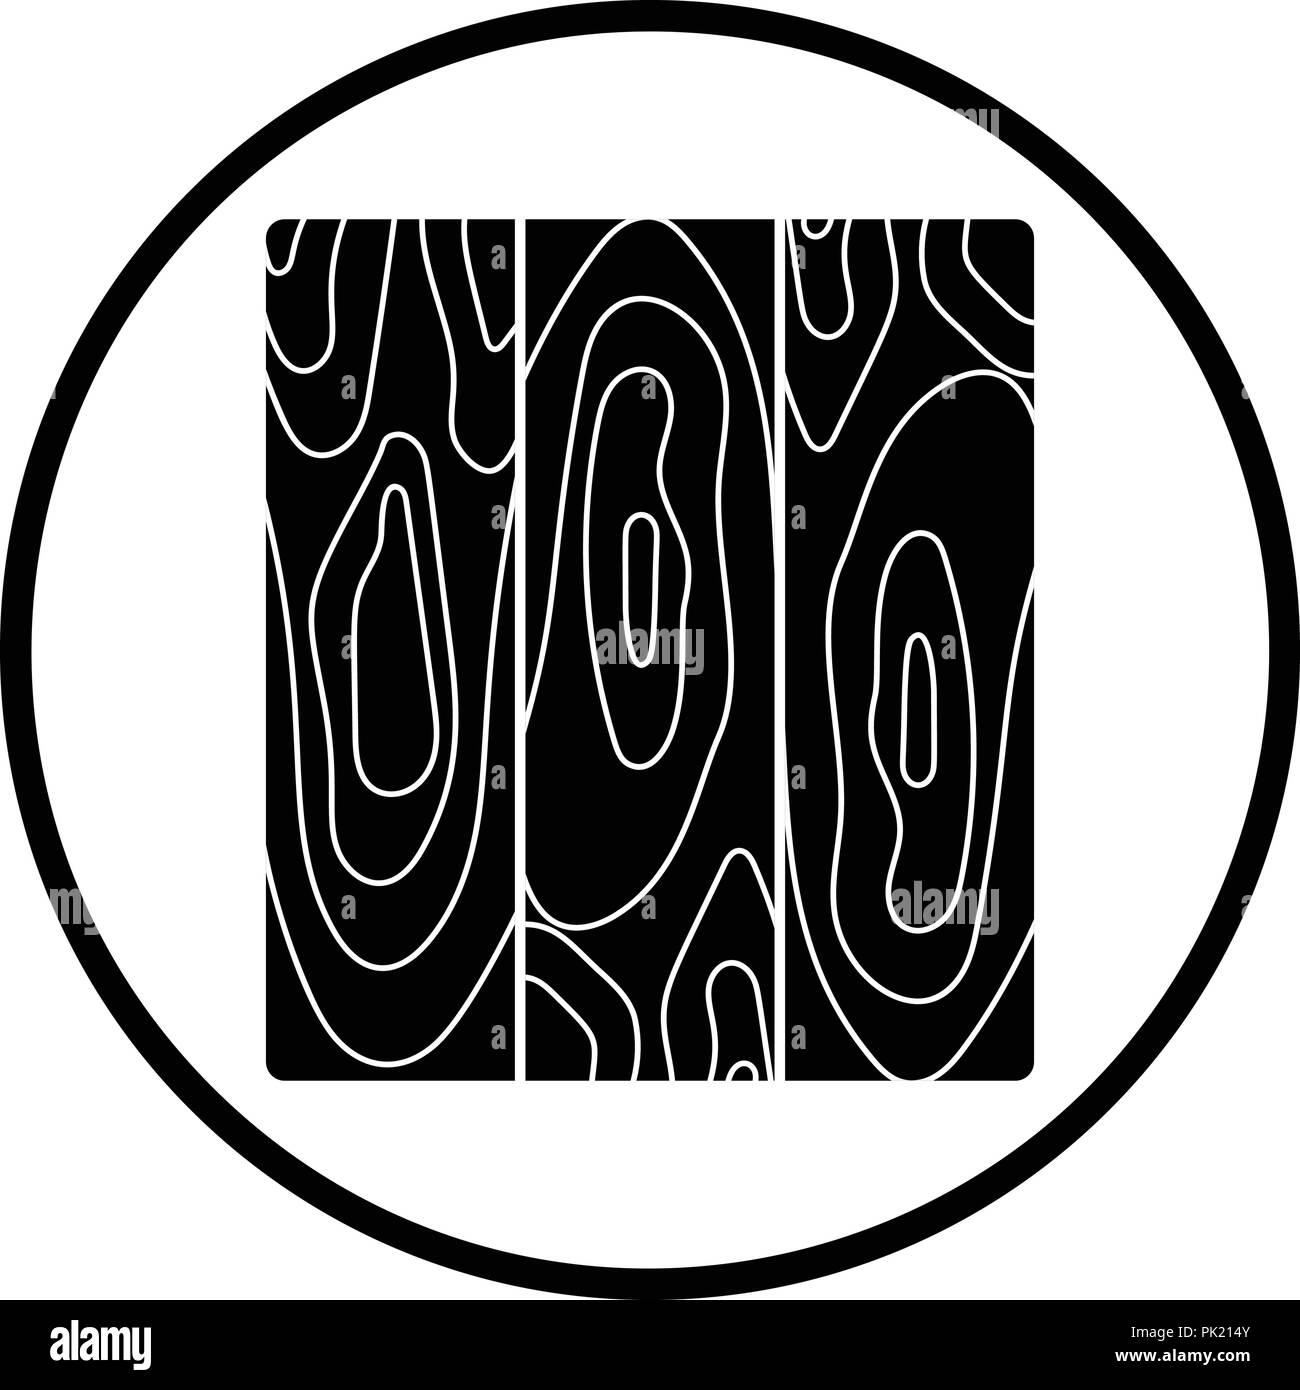 Icon of parquet plank pattern. Thin circle design. Vector illustration. Stock Vector